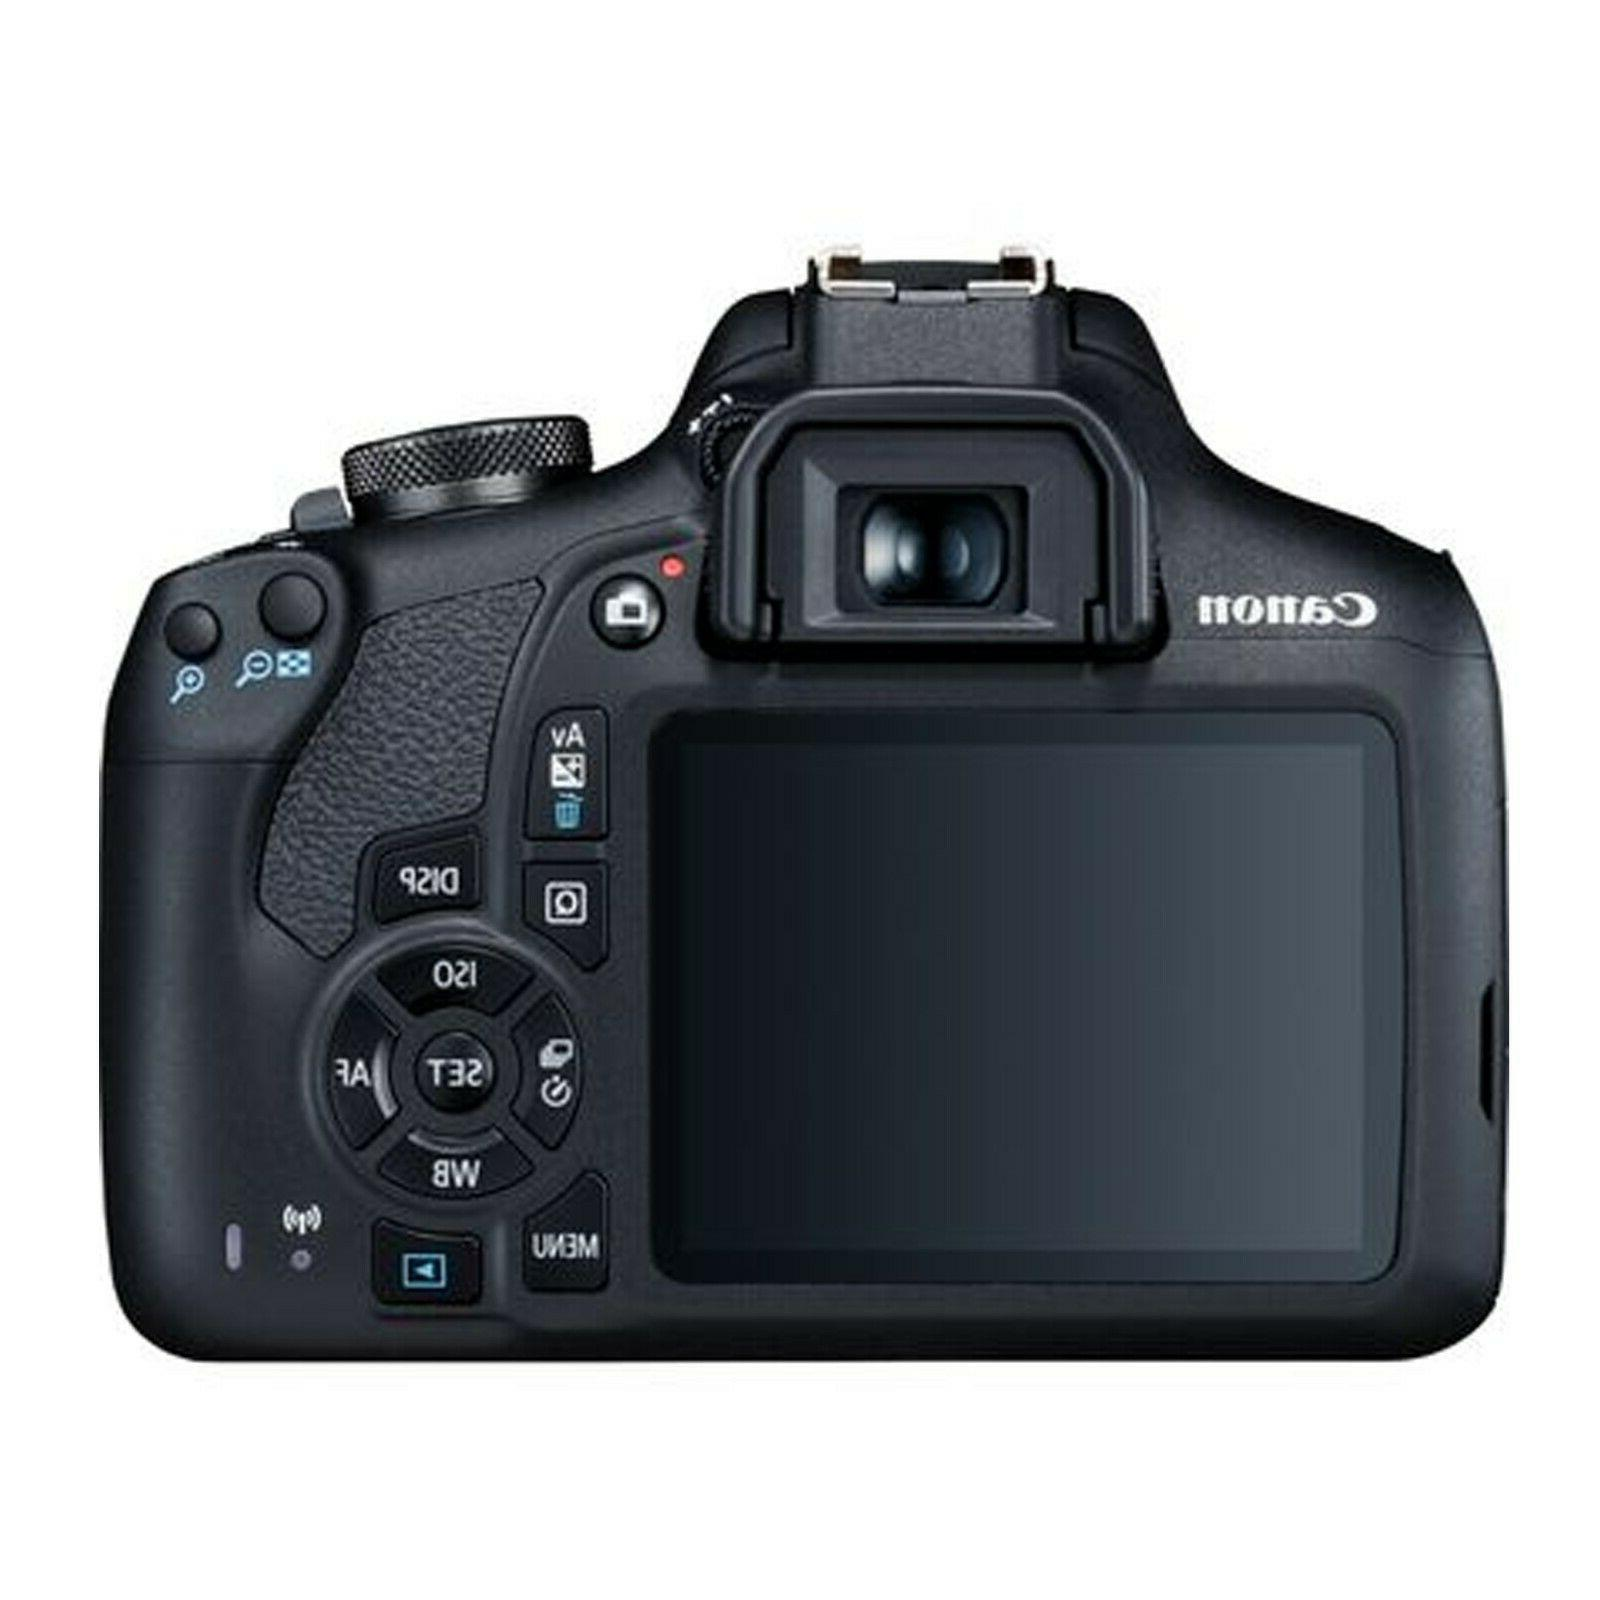 Canon 2000D / Rebel T7 + EF-S 18-55mm Lens+ 128GB Bundle